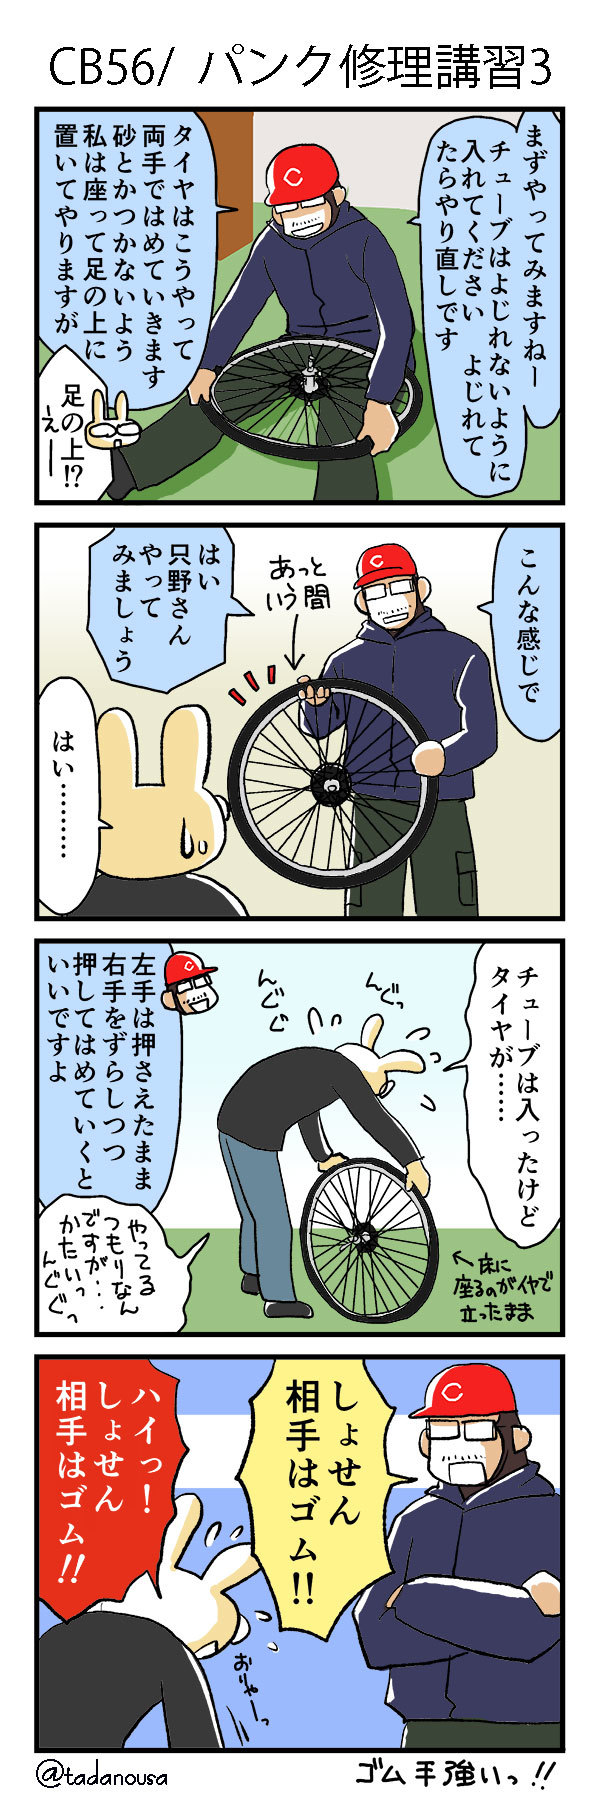 bike_4koma_kako096_s.jpg